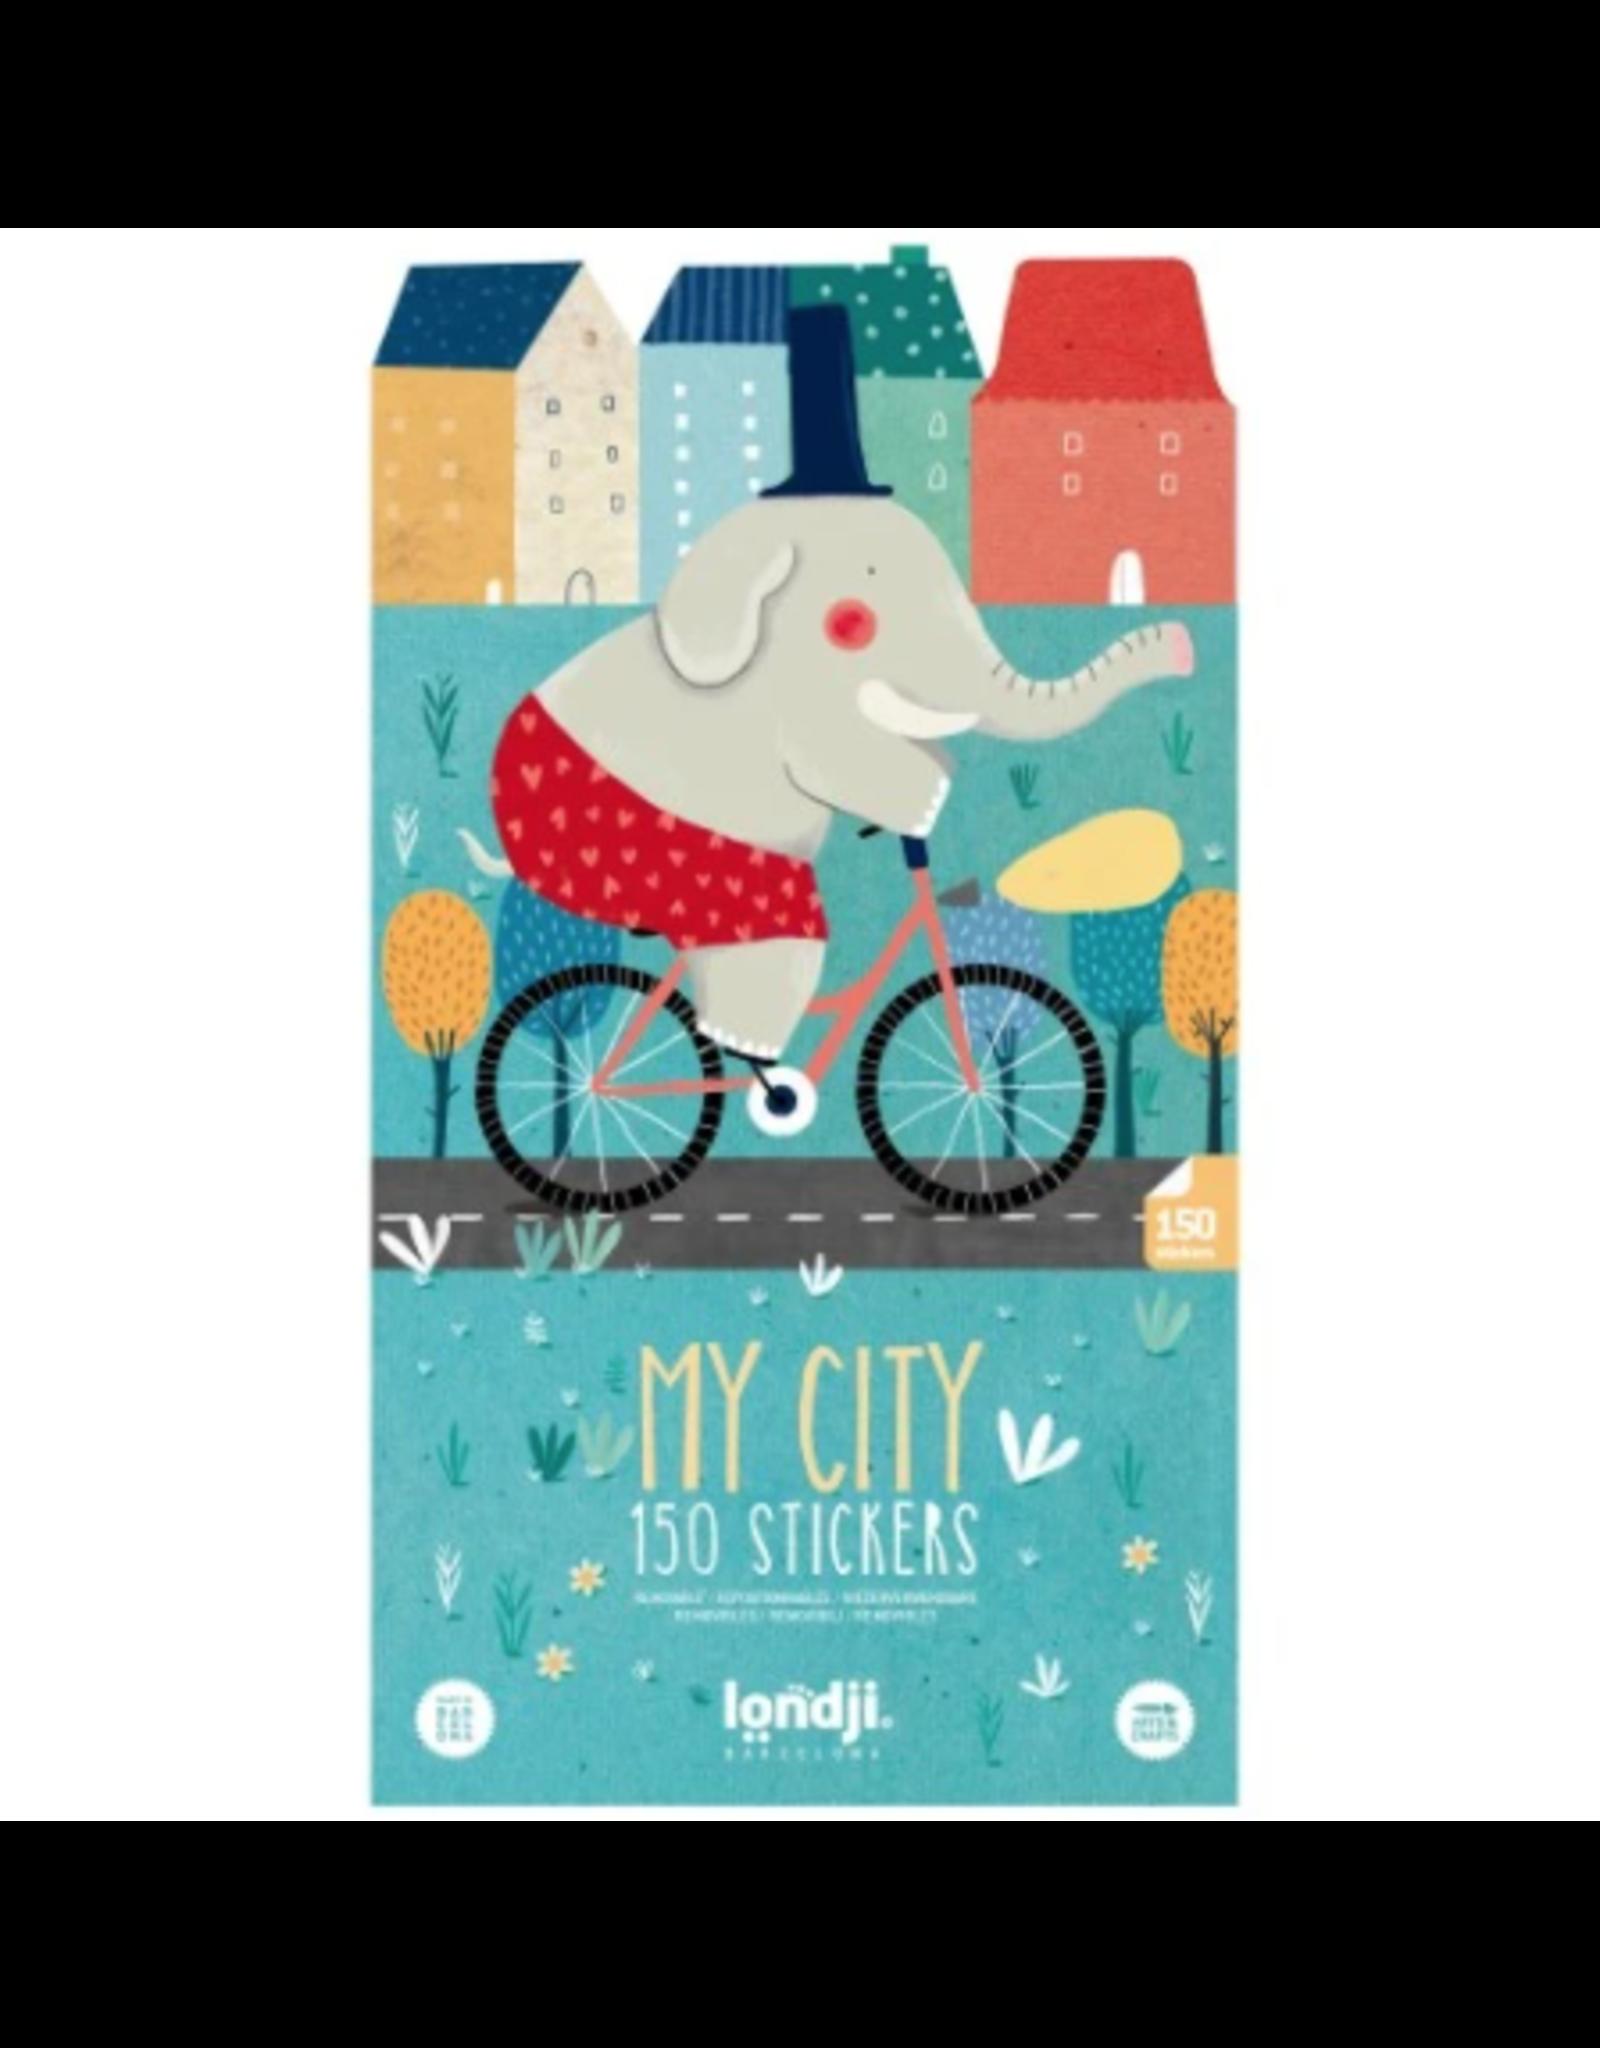 Londji 150 Stickers, My City